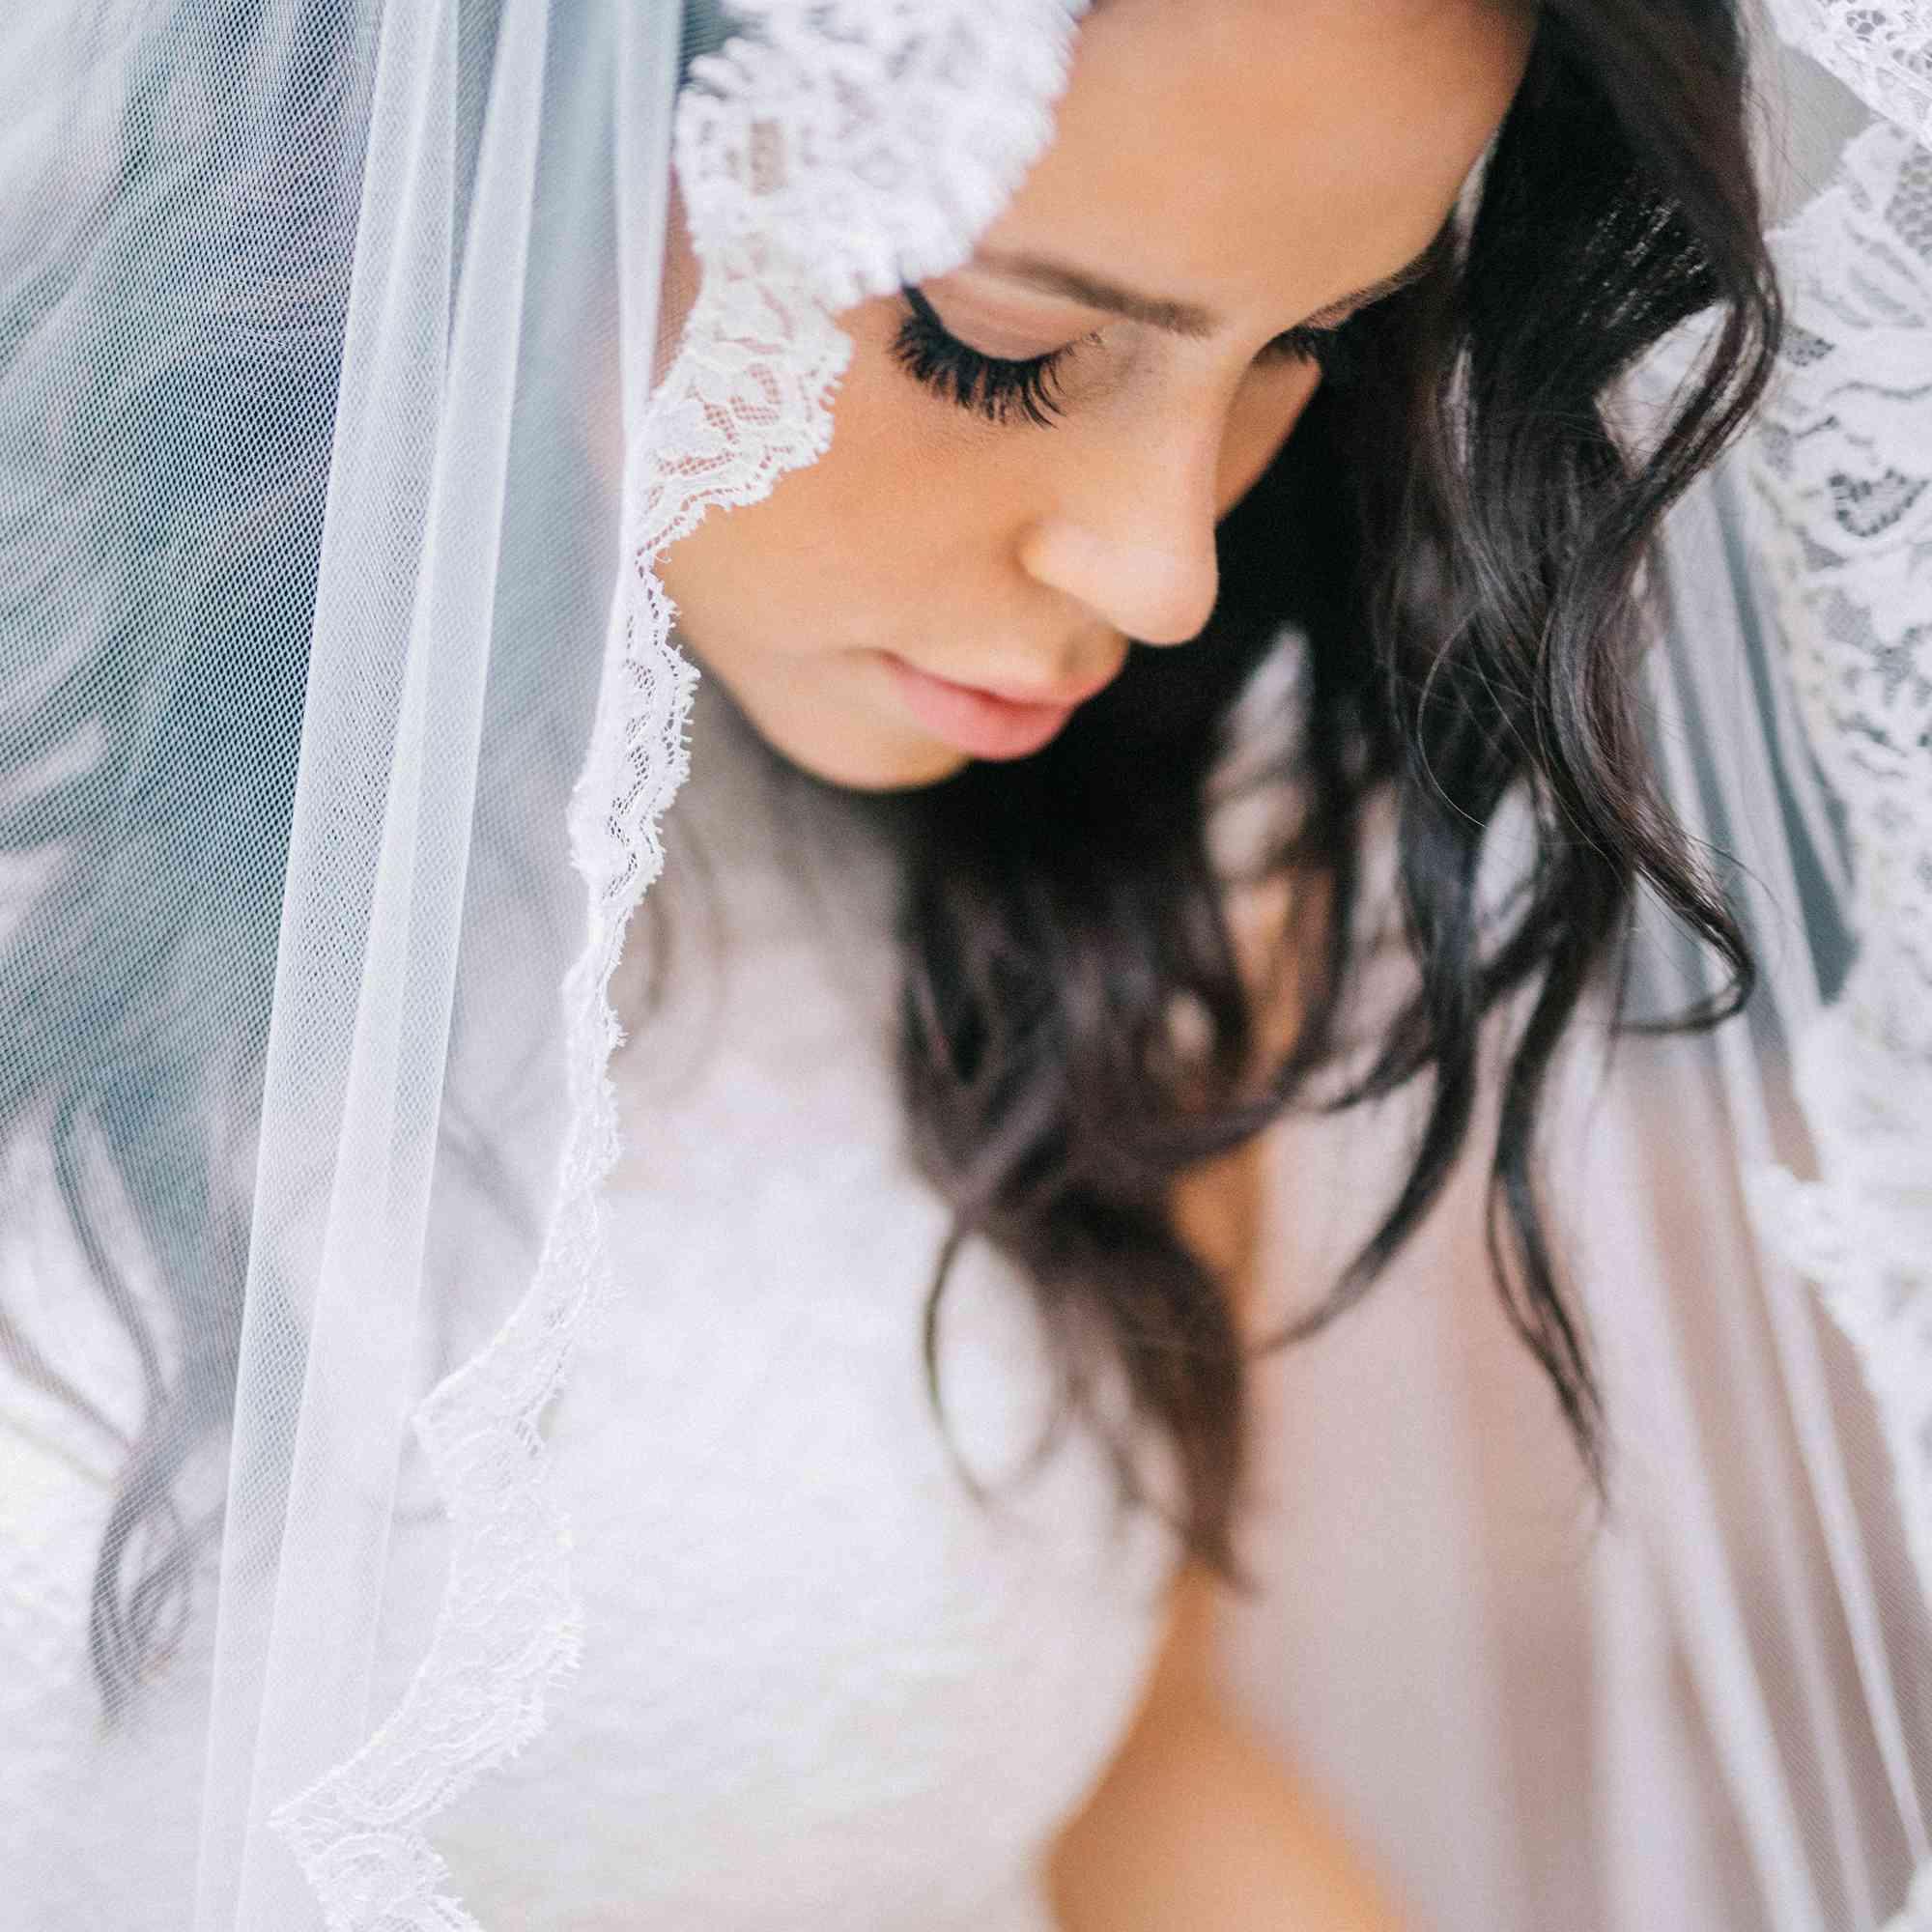 Shot of bride in veil